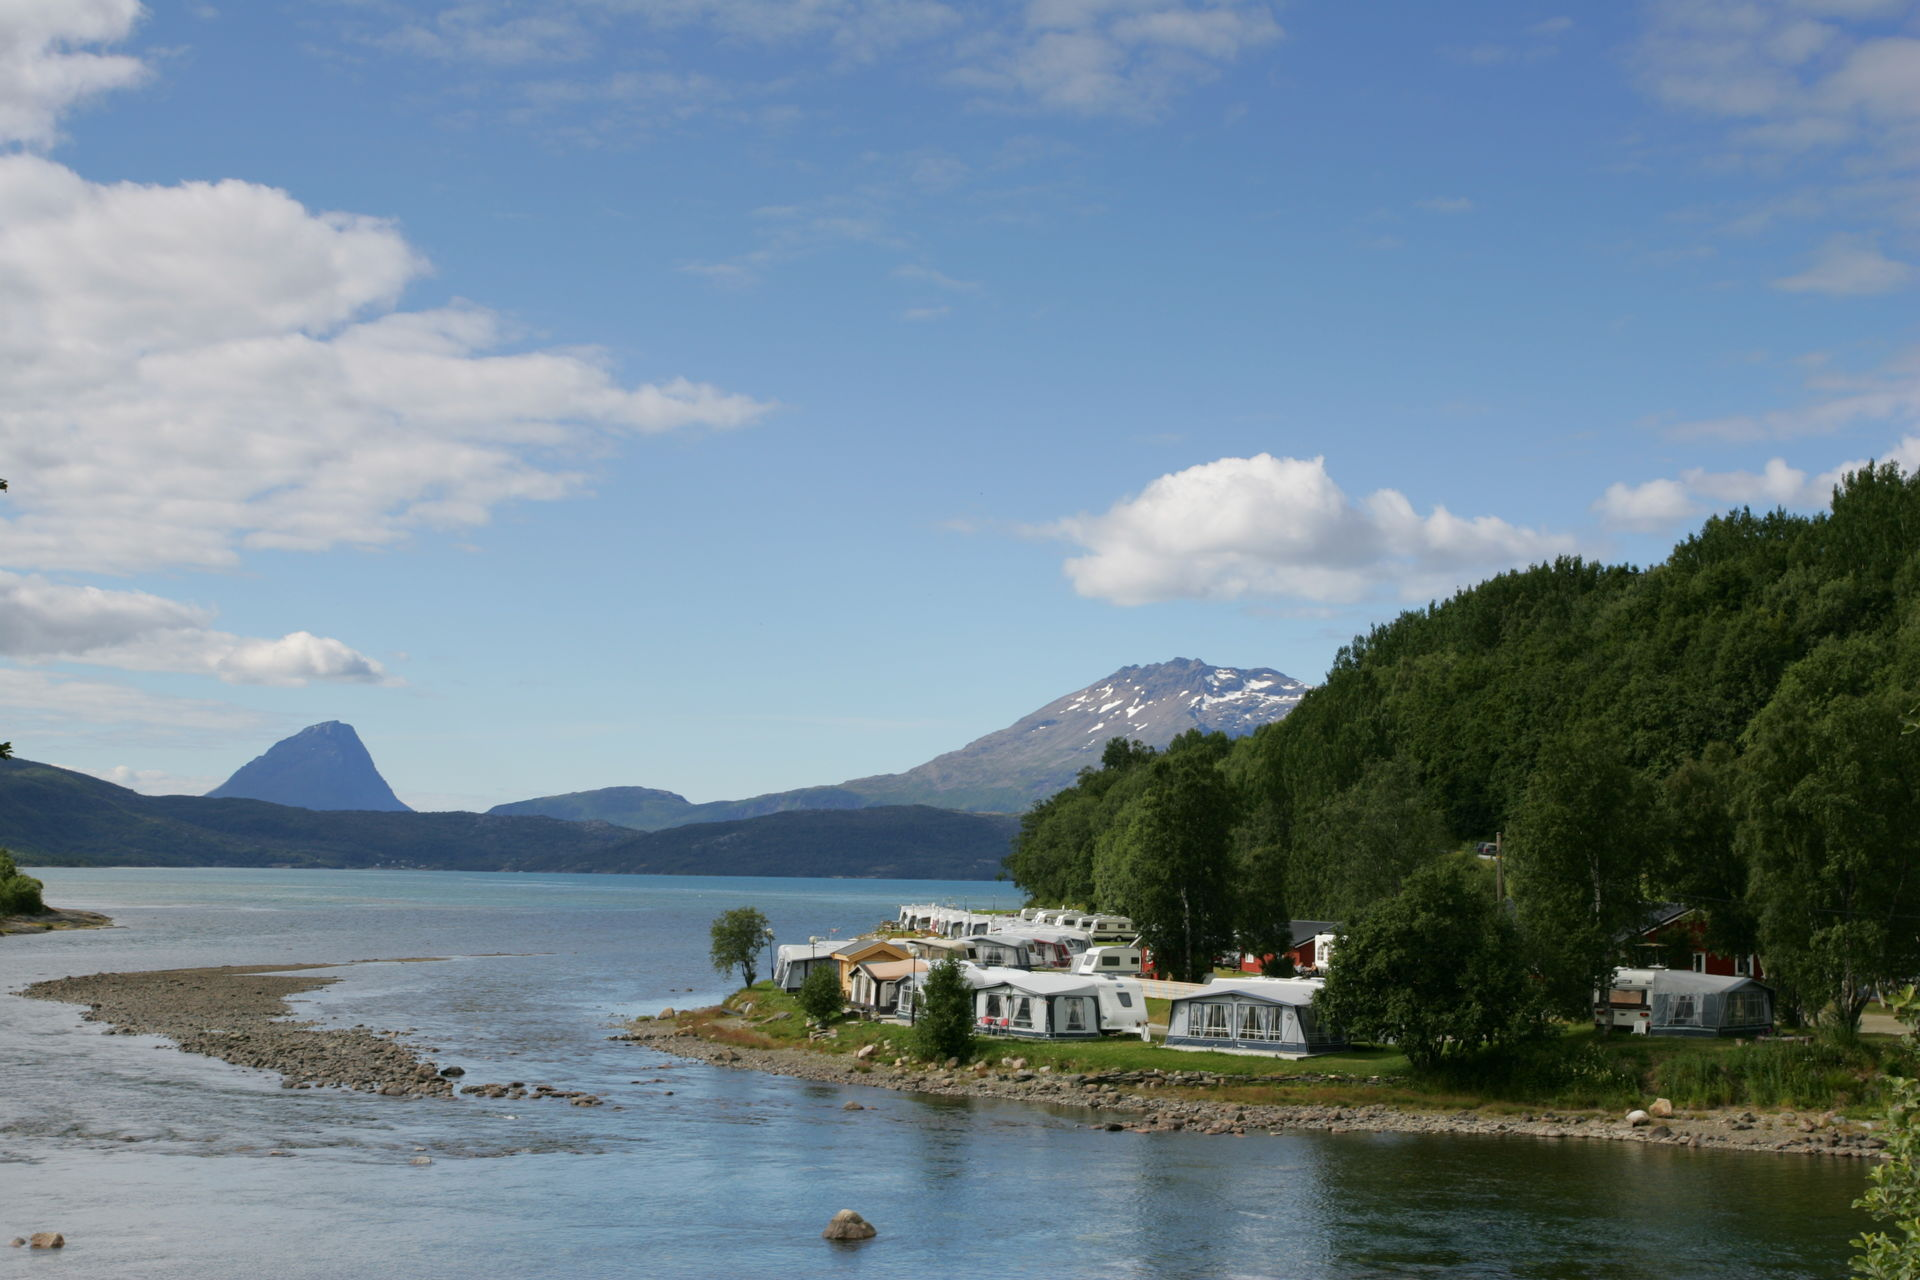 Camping i Harstad (c) Frank Andreassen